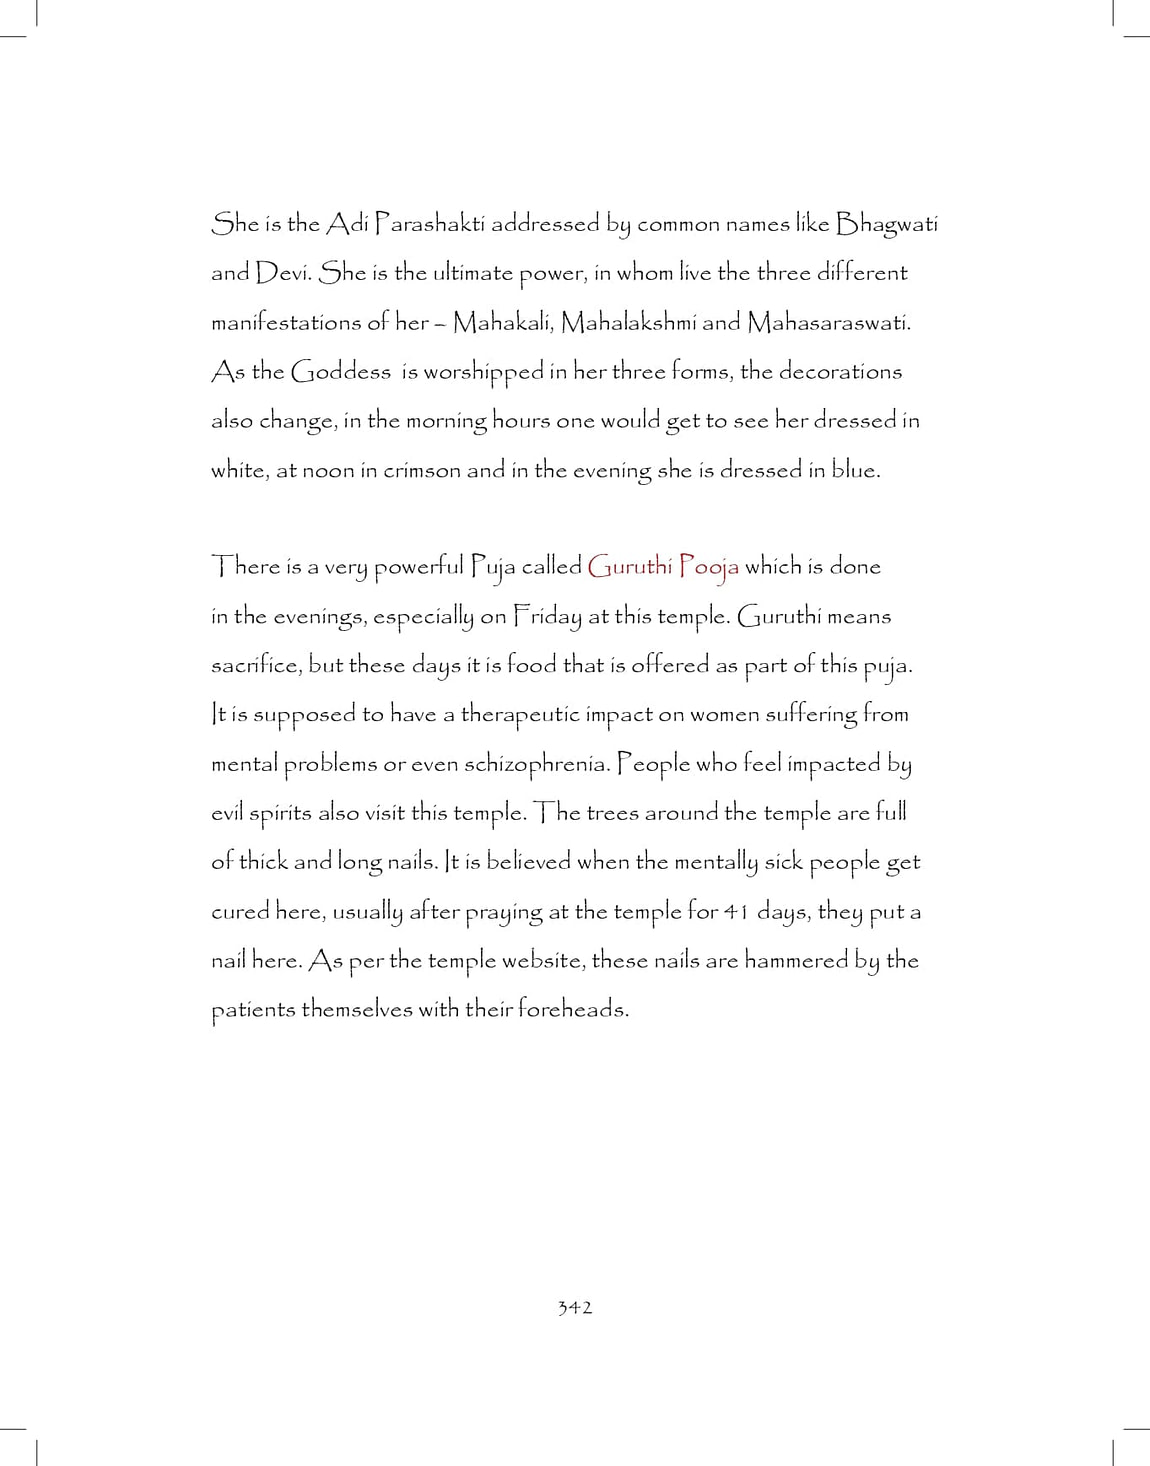 Ganesh-print_pages-to-jpg-0342.jpg